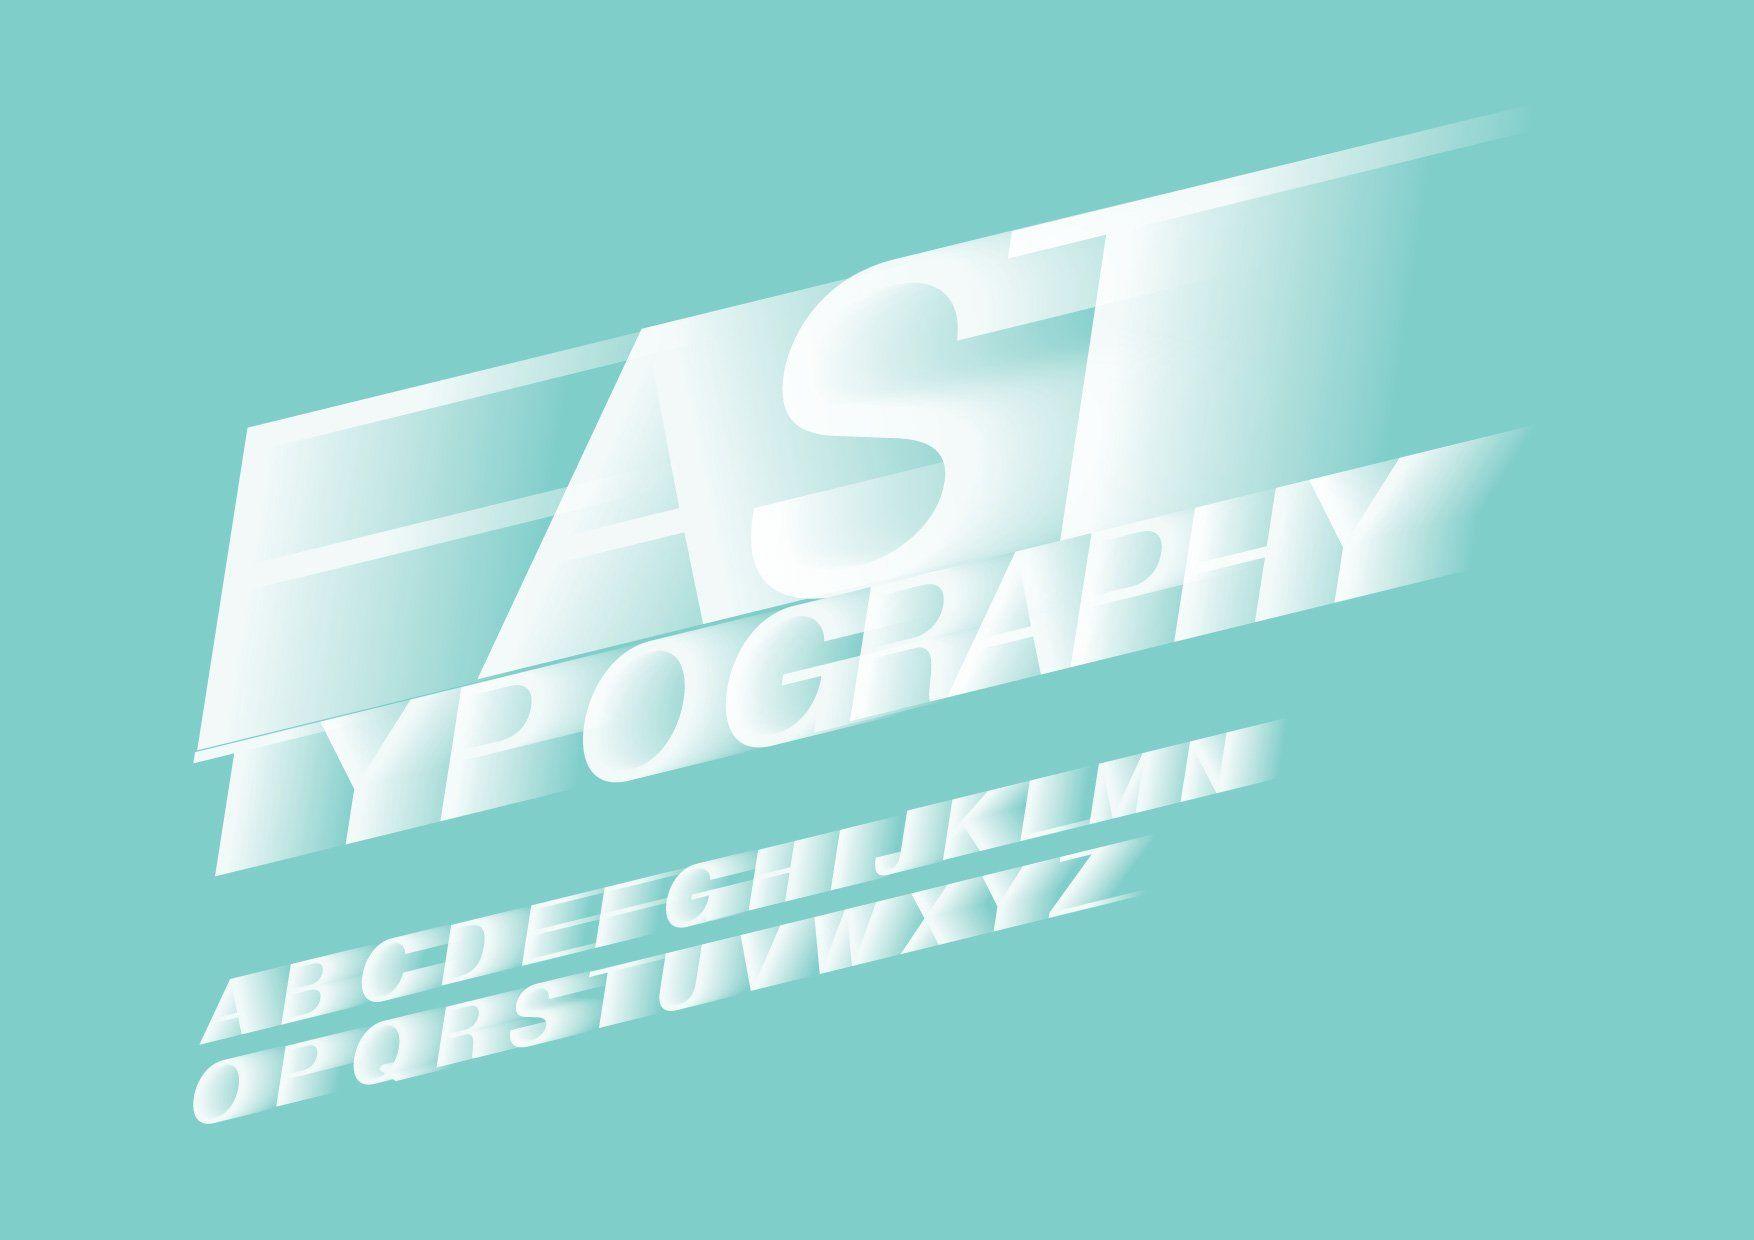 Motion blur effects